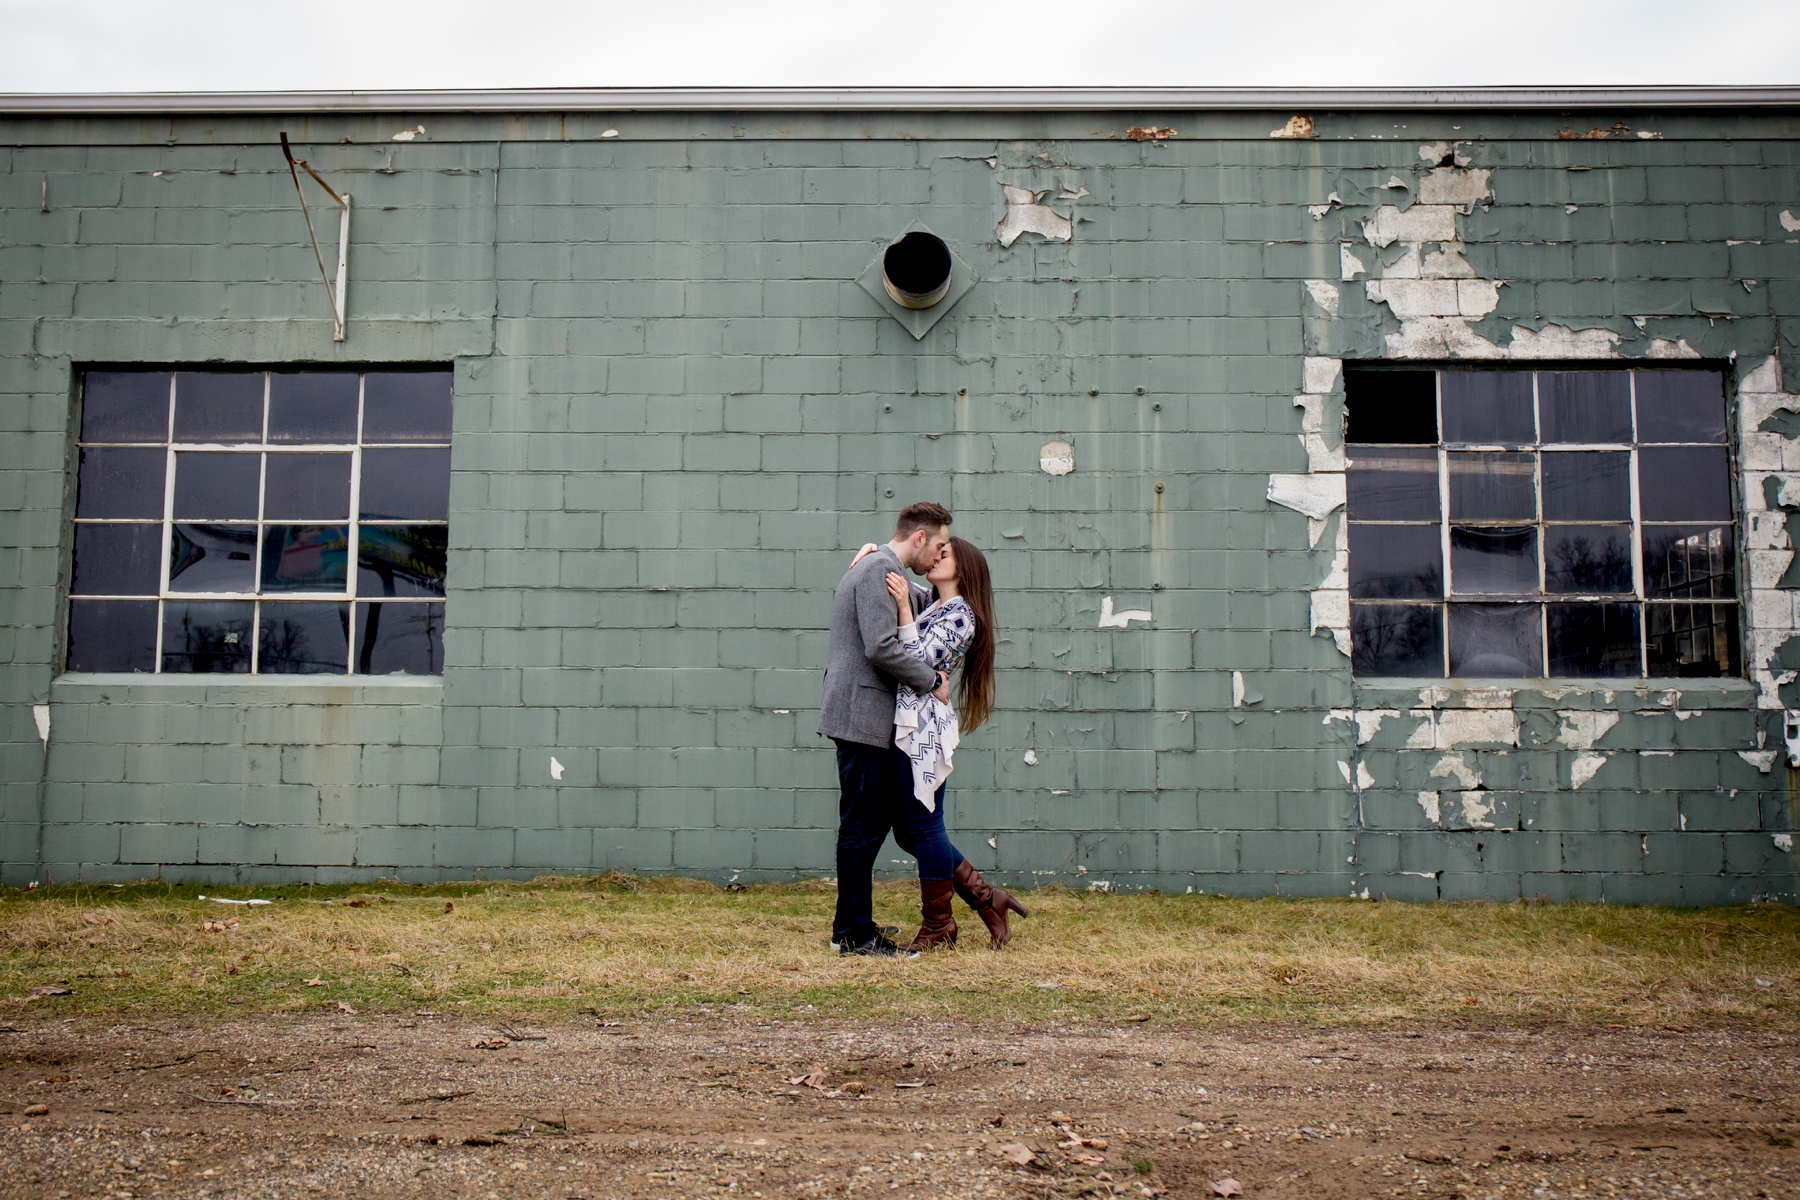 Brandon_Shafer_Photography_Kim_Nick_Engagement_0022.jpg